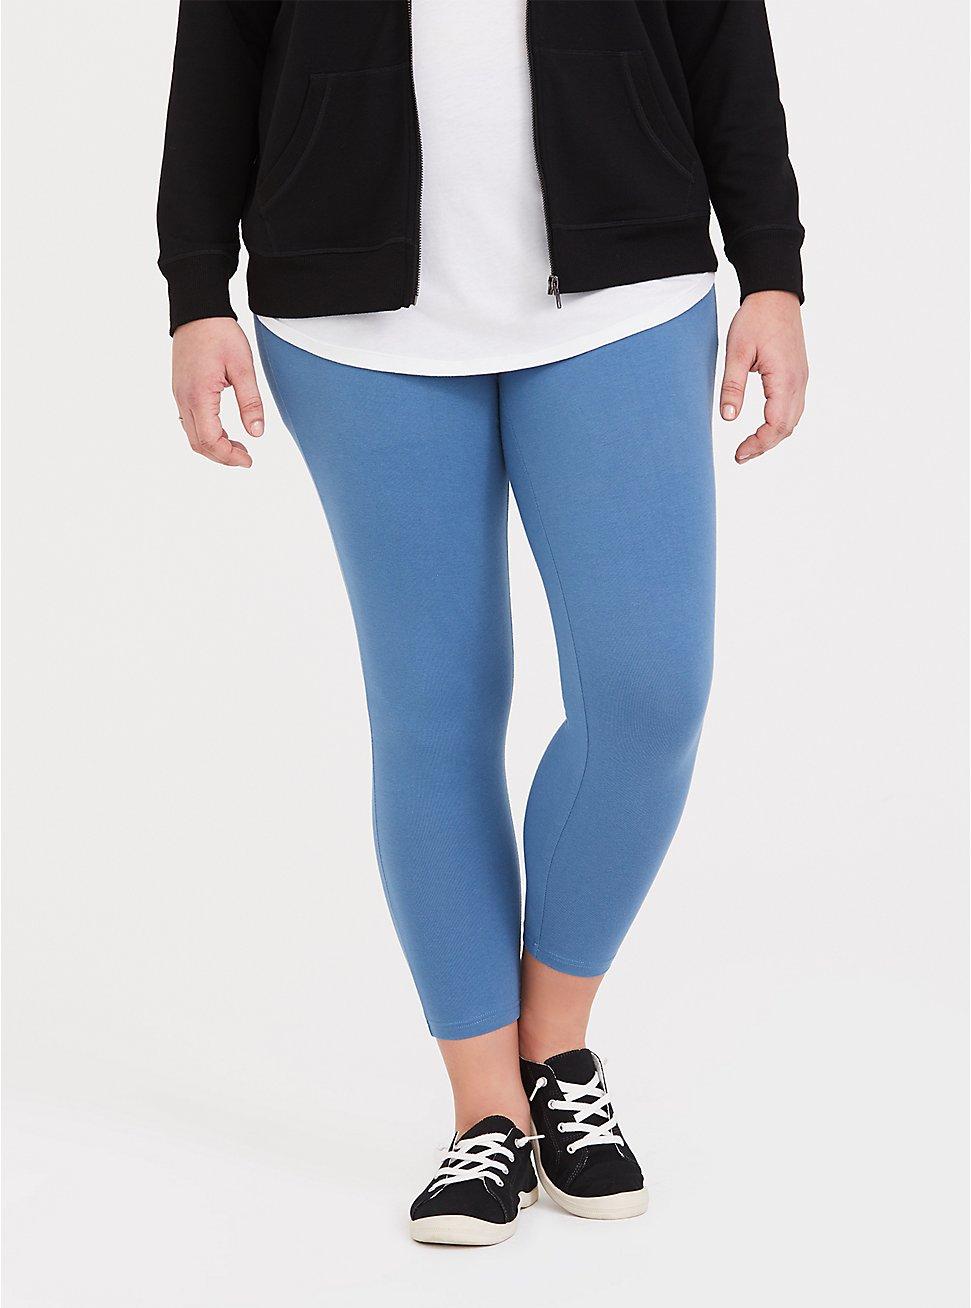 Plus Size Crop Premium Legging - Heathered Light Blue, STELLAR BLUE, hi-res